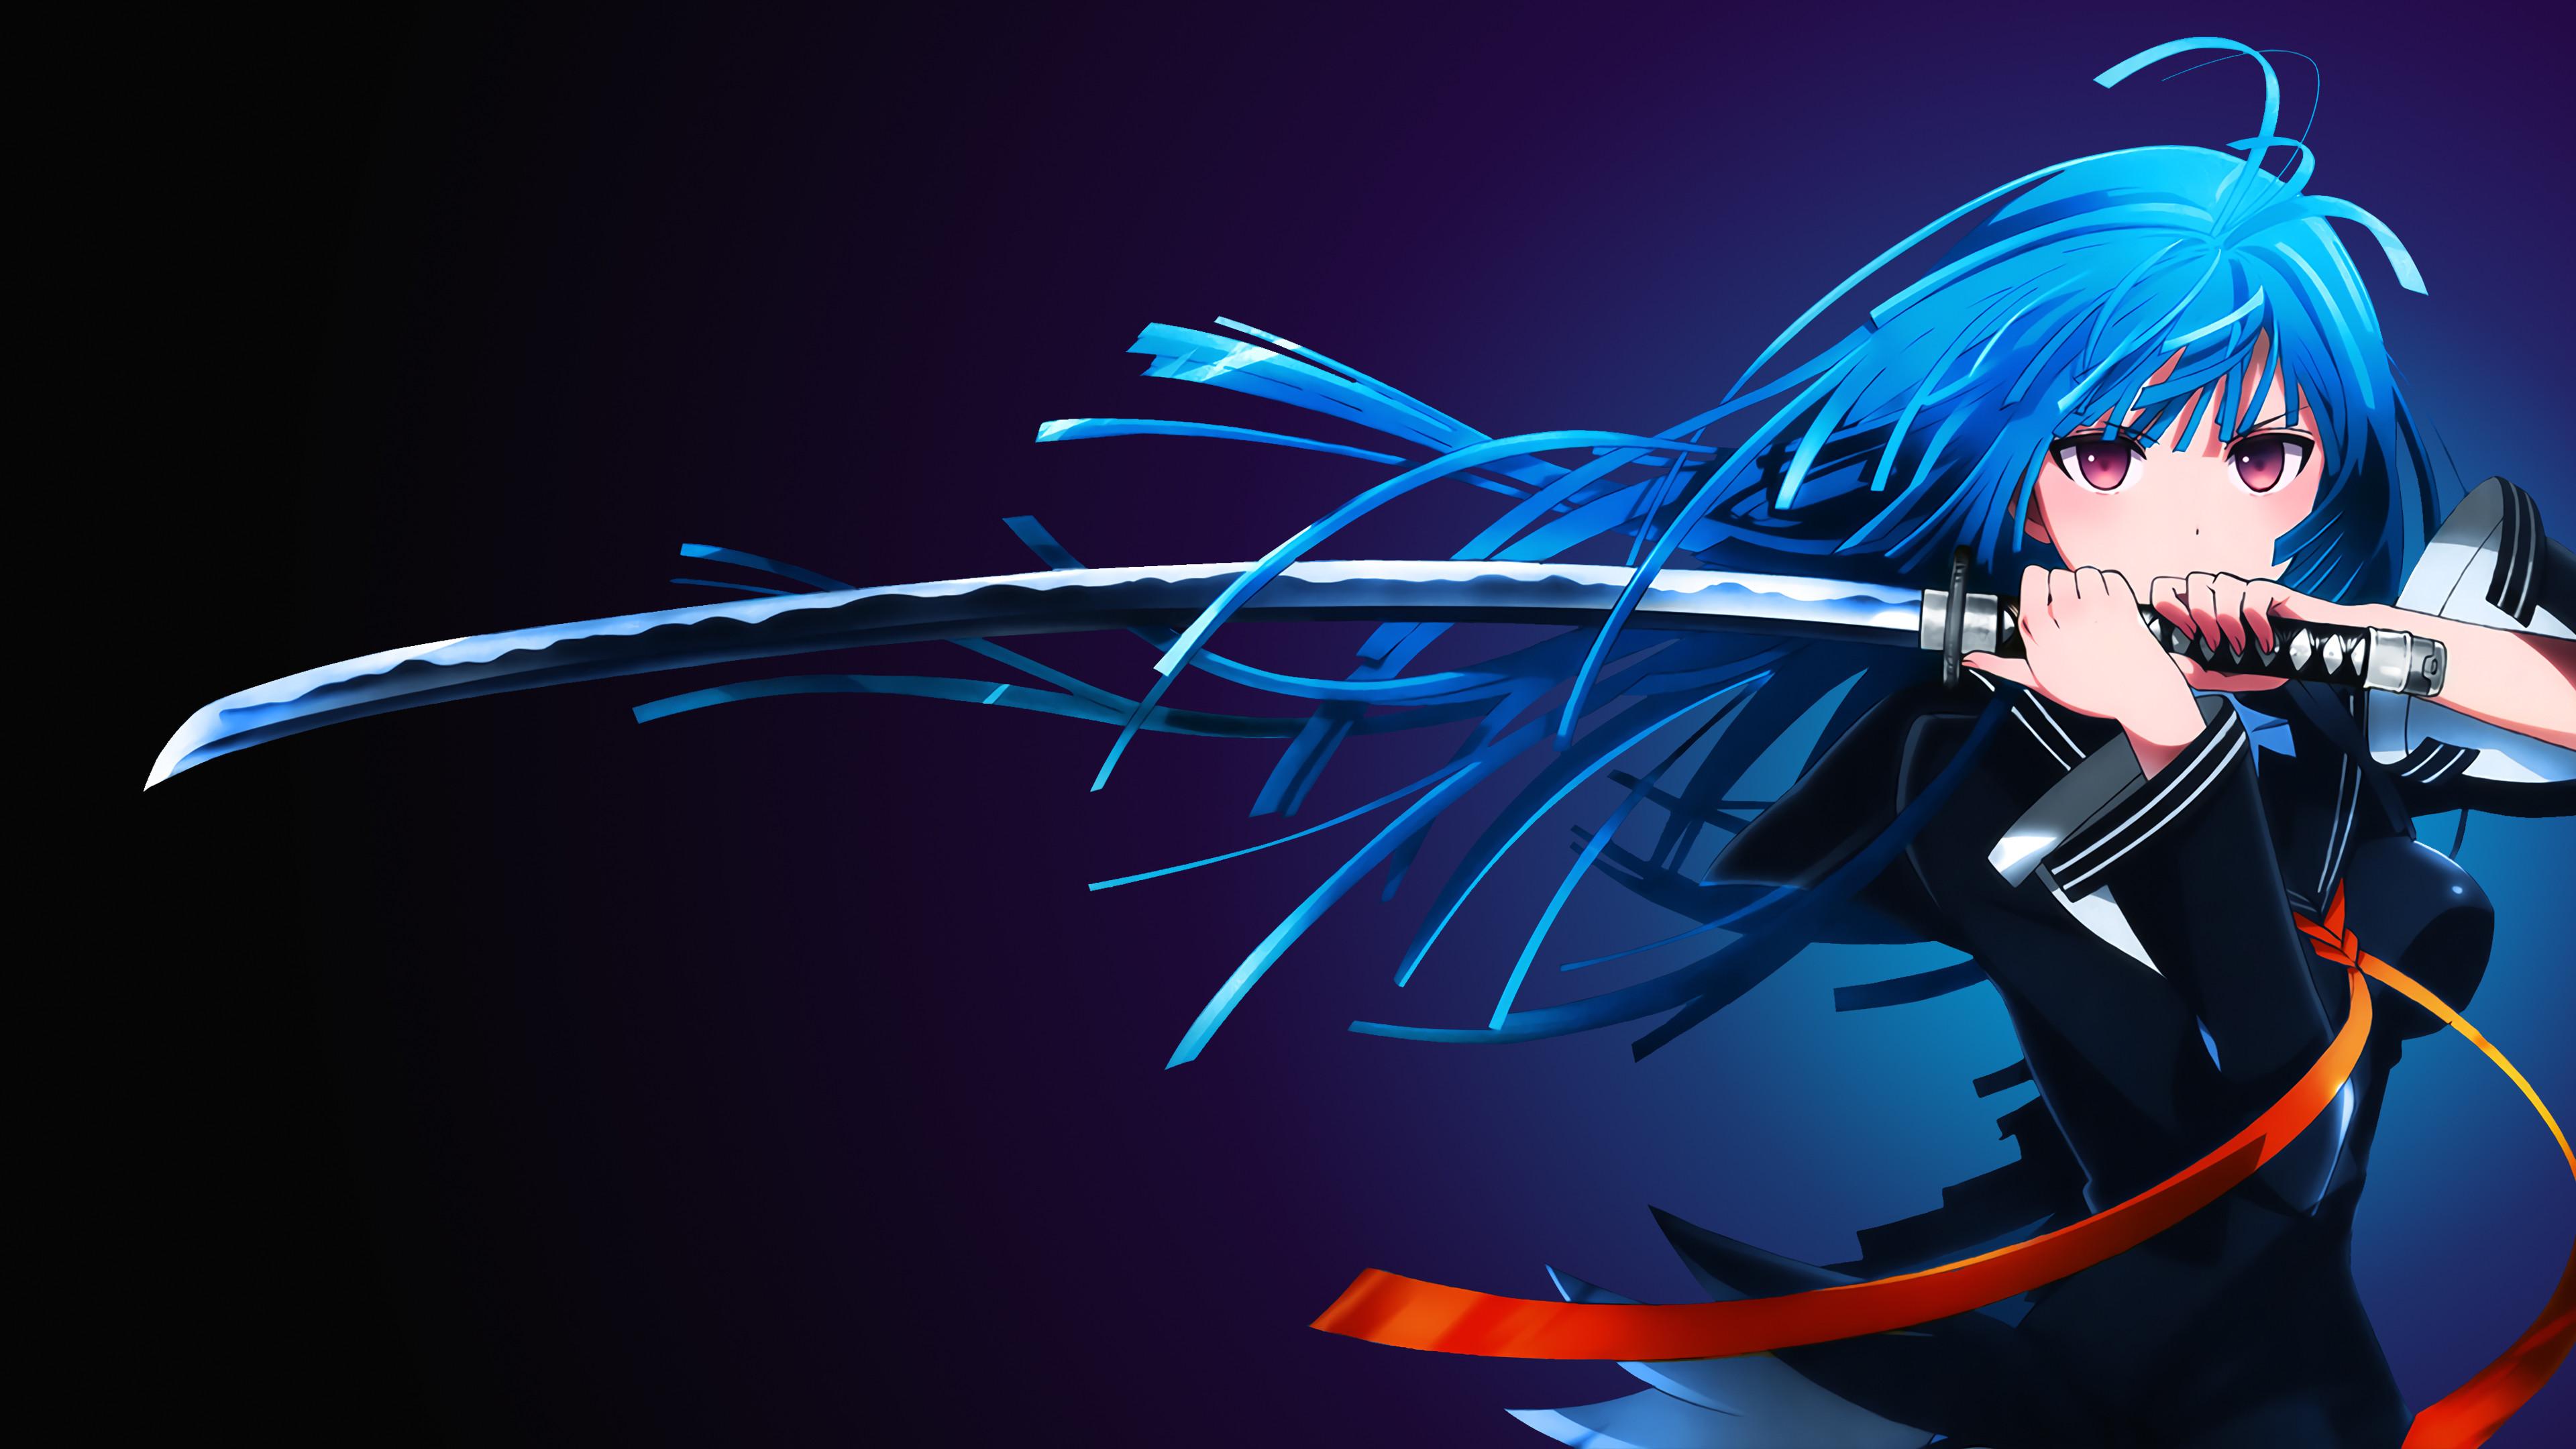 Kisara Tendou, Anime girl, Katana, 4K